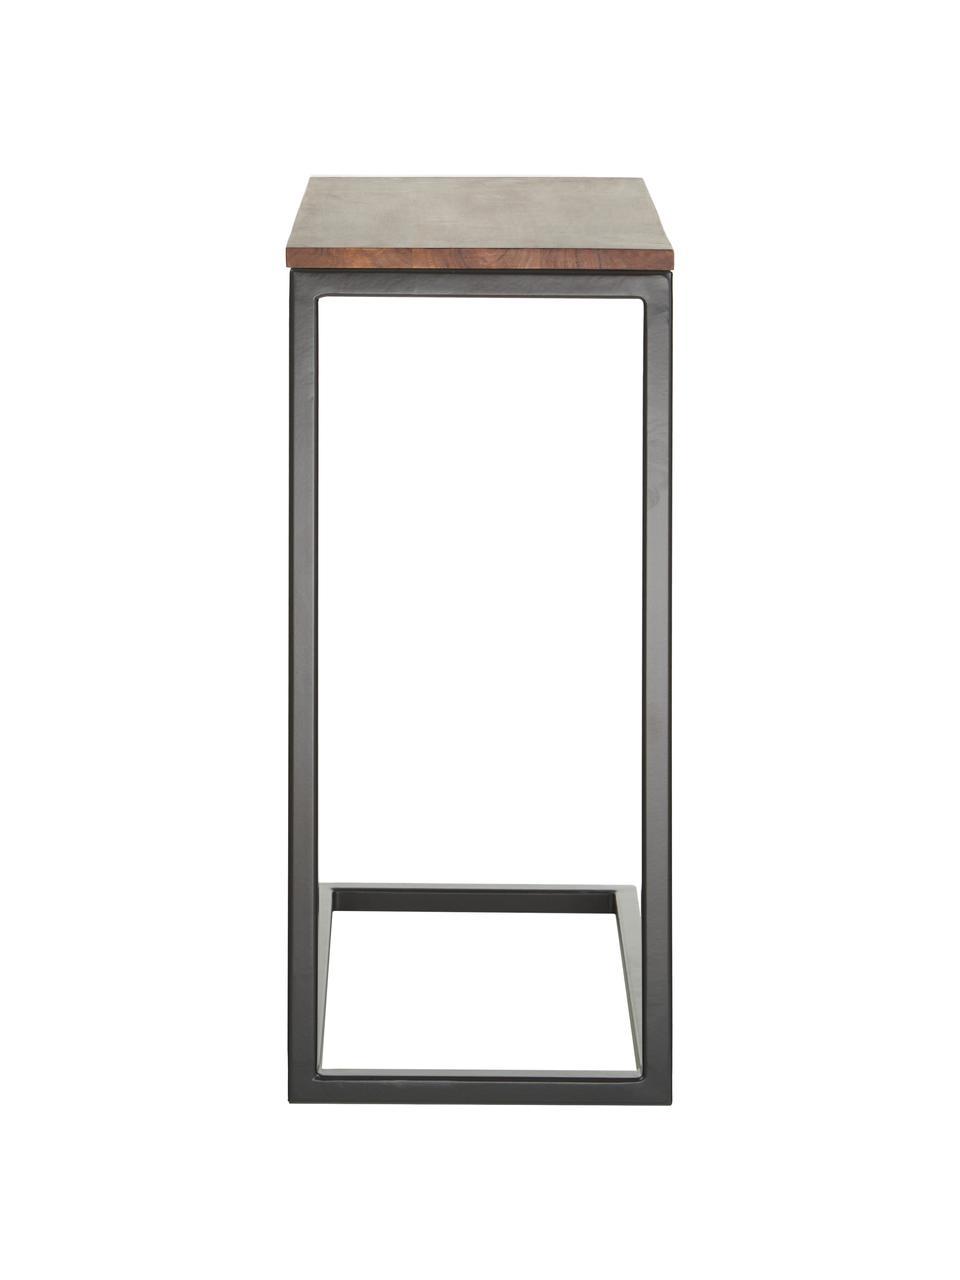 Akazienholz-Beistelltisch Celow, Tischplatte: Massives Akazienholz, lac, Gestell: Metall, pulverbeschichtet, Schwarz, 45 x 62 cm